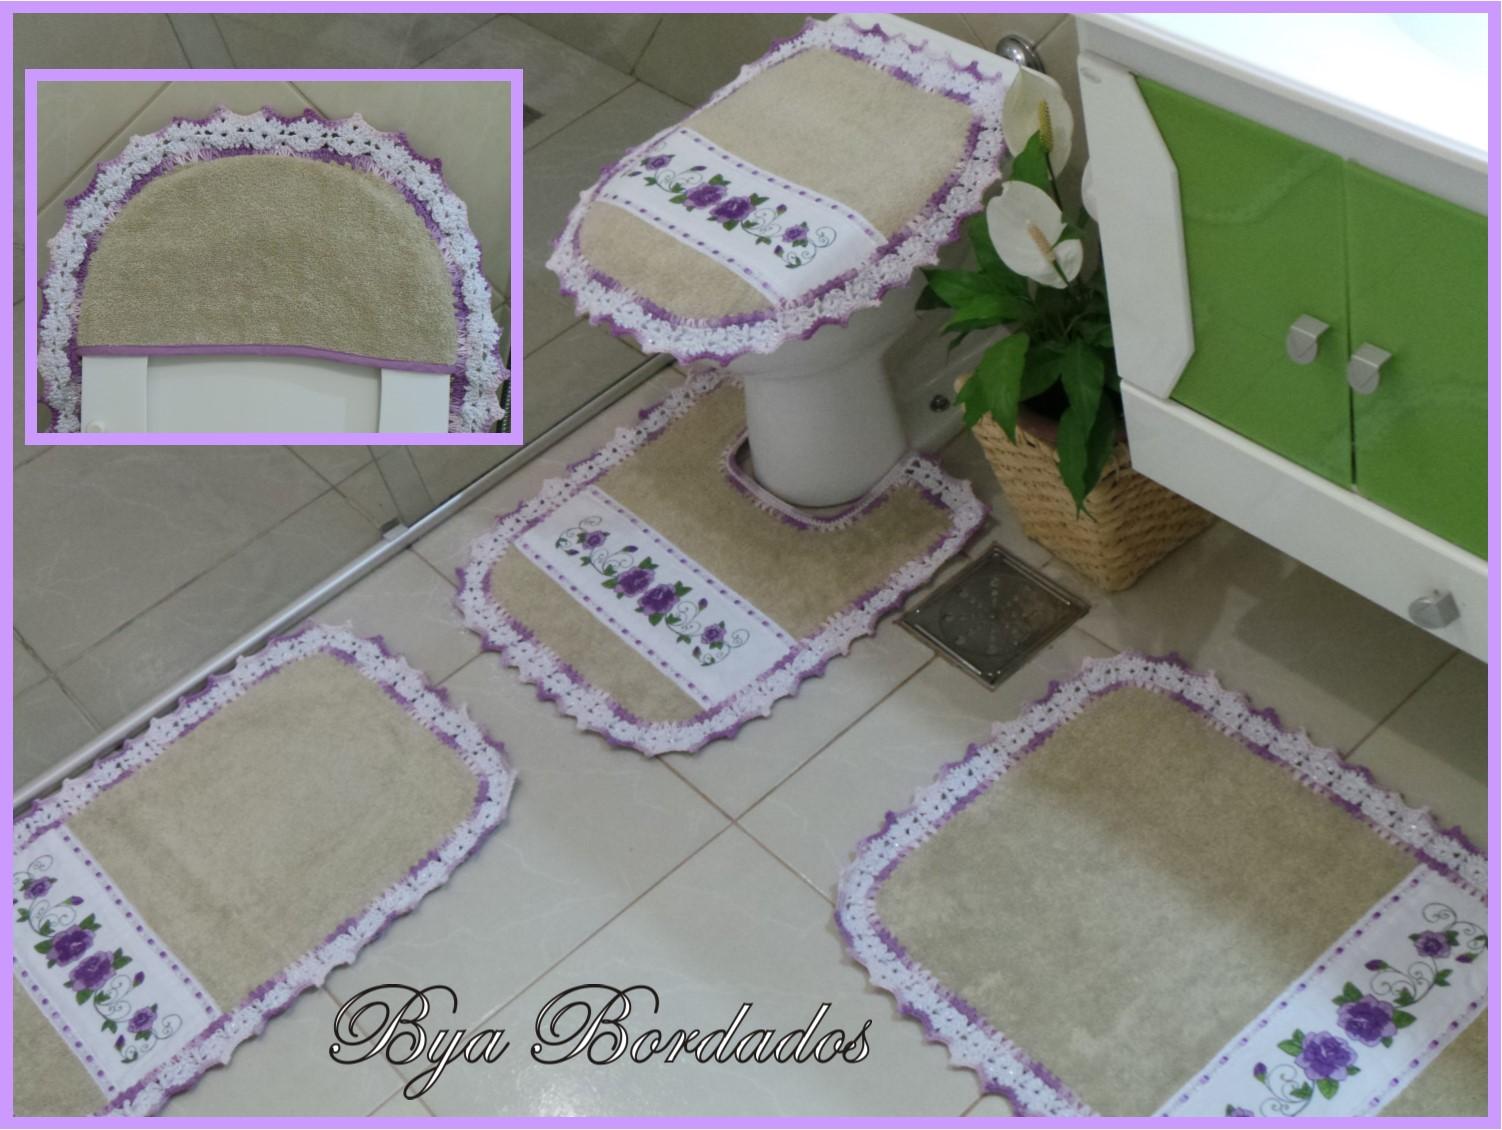 jogo tapete banheiro atoalhado jogo banheiro atoalhado #6F12B9 1502 1130